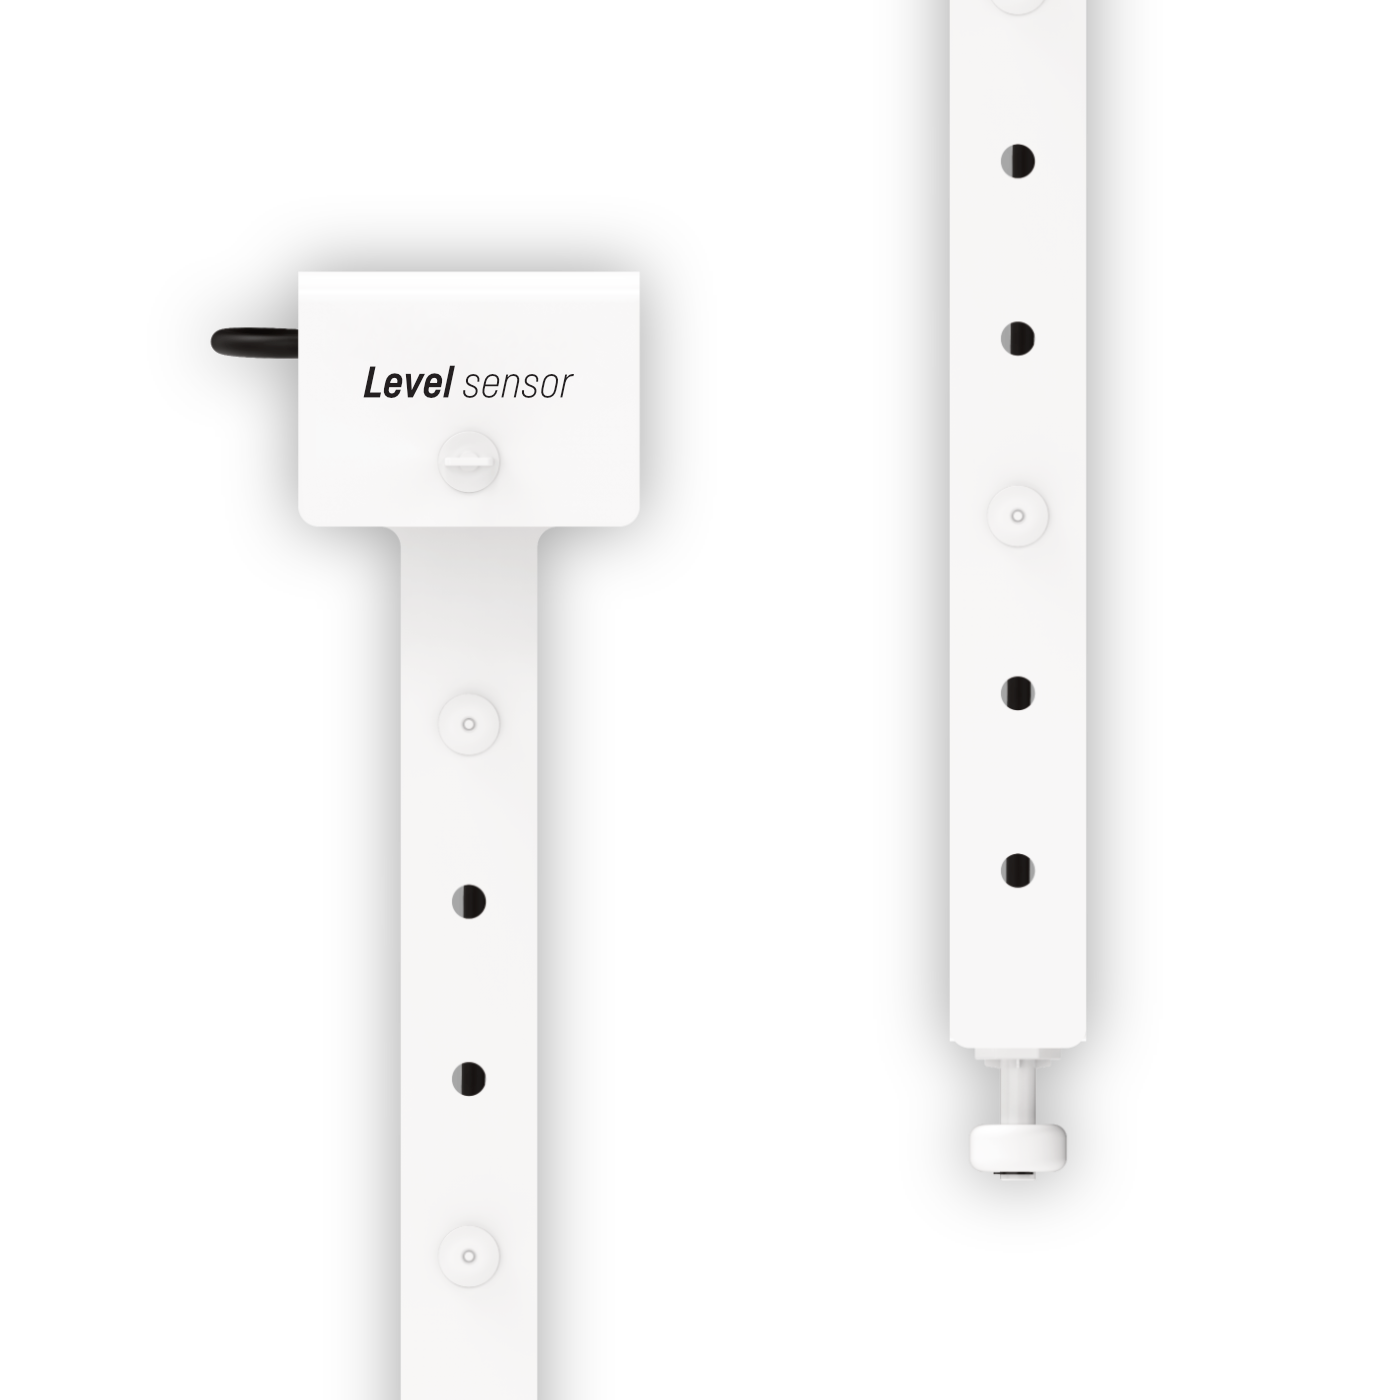 Reef Factory Level Sensor